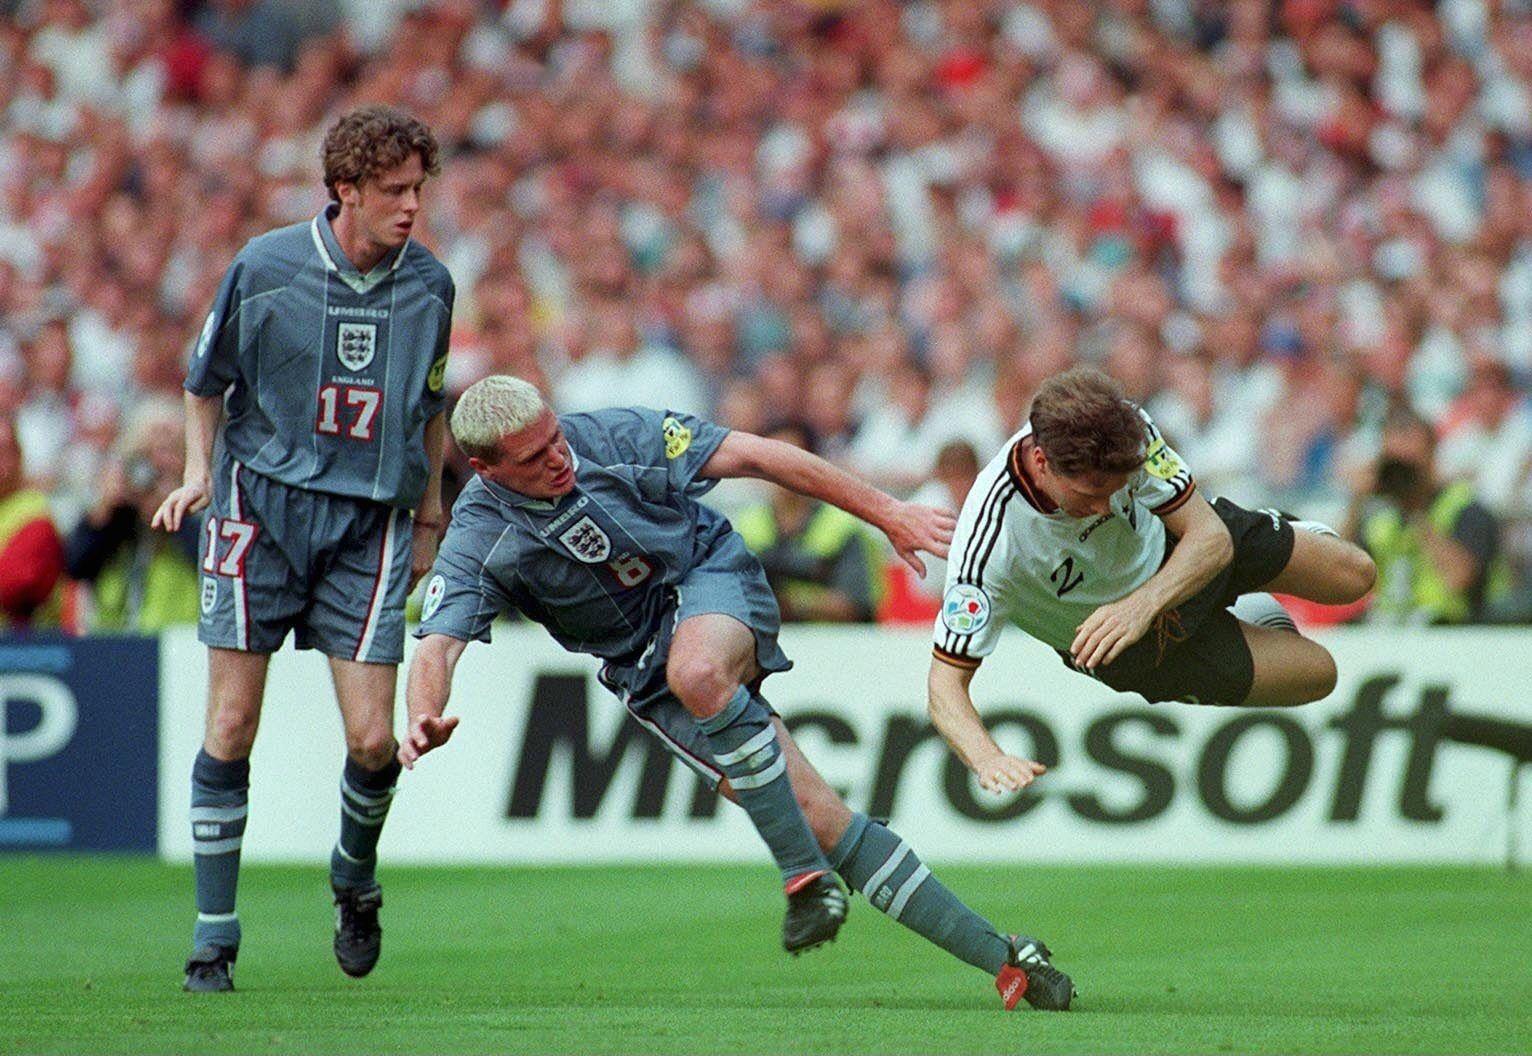 McMANAMAN/GASCOIGNE/REUTER/Halbfinale ENGLAND